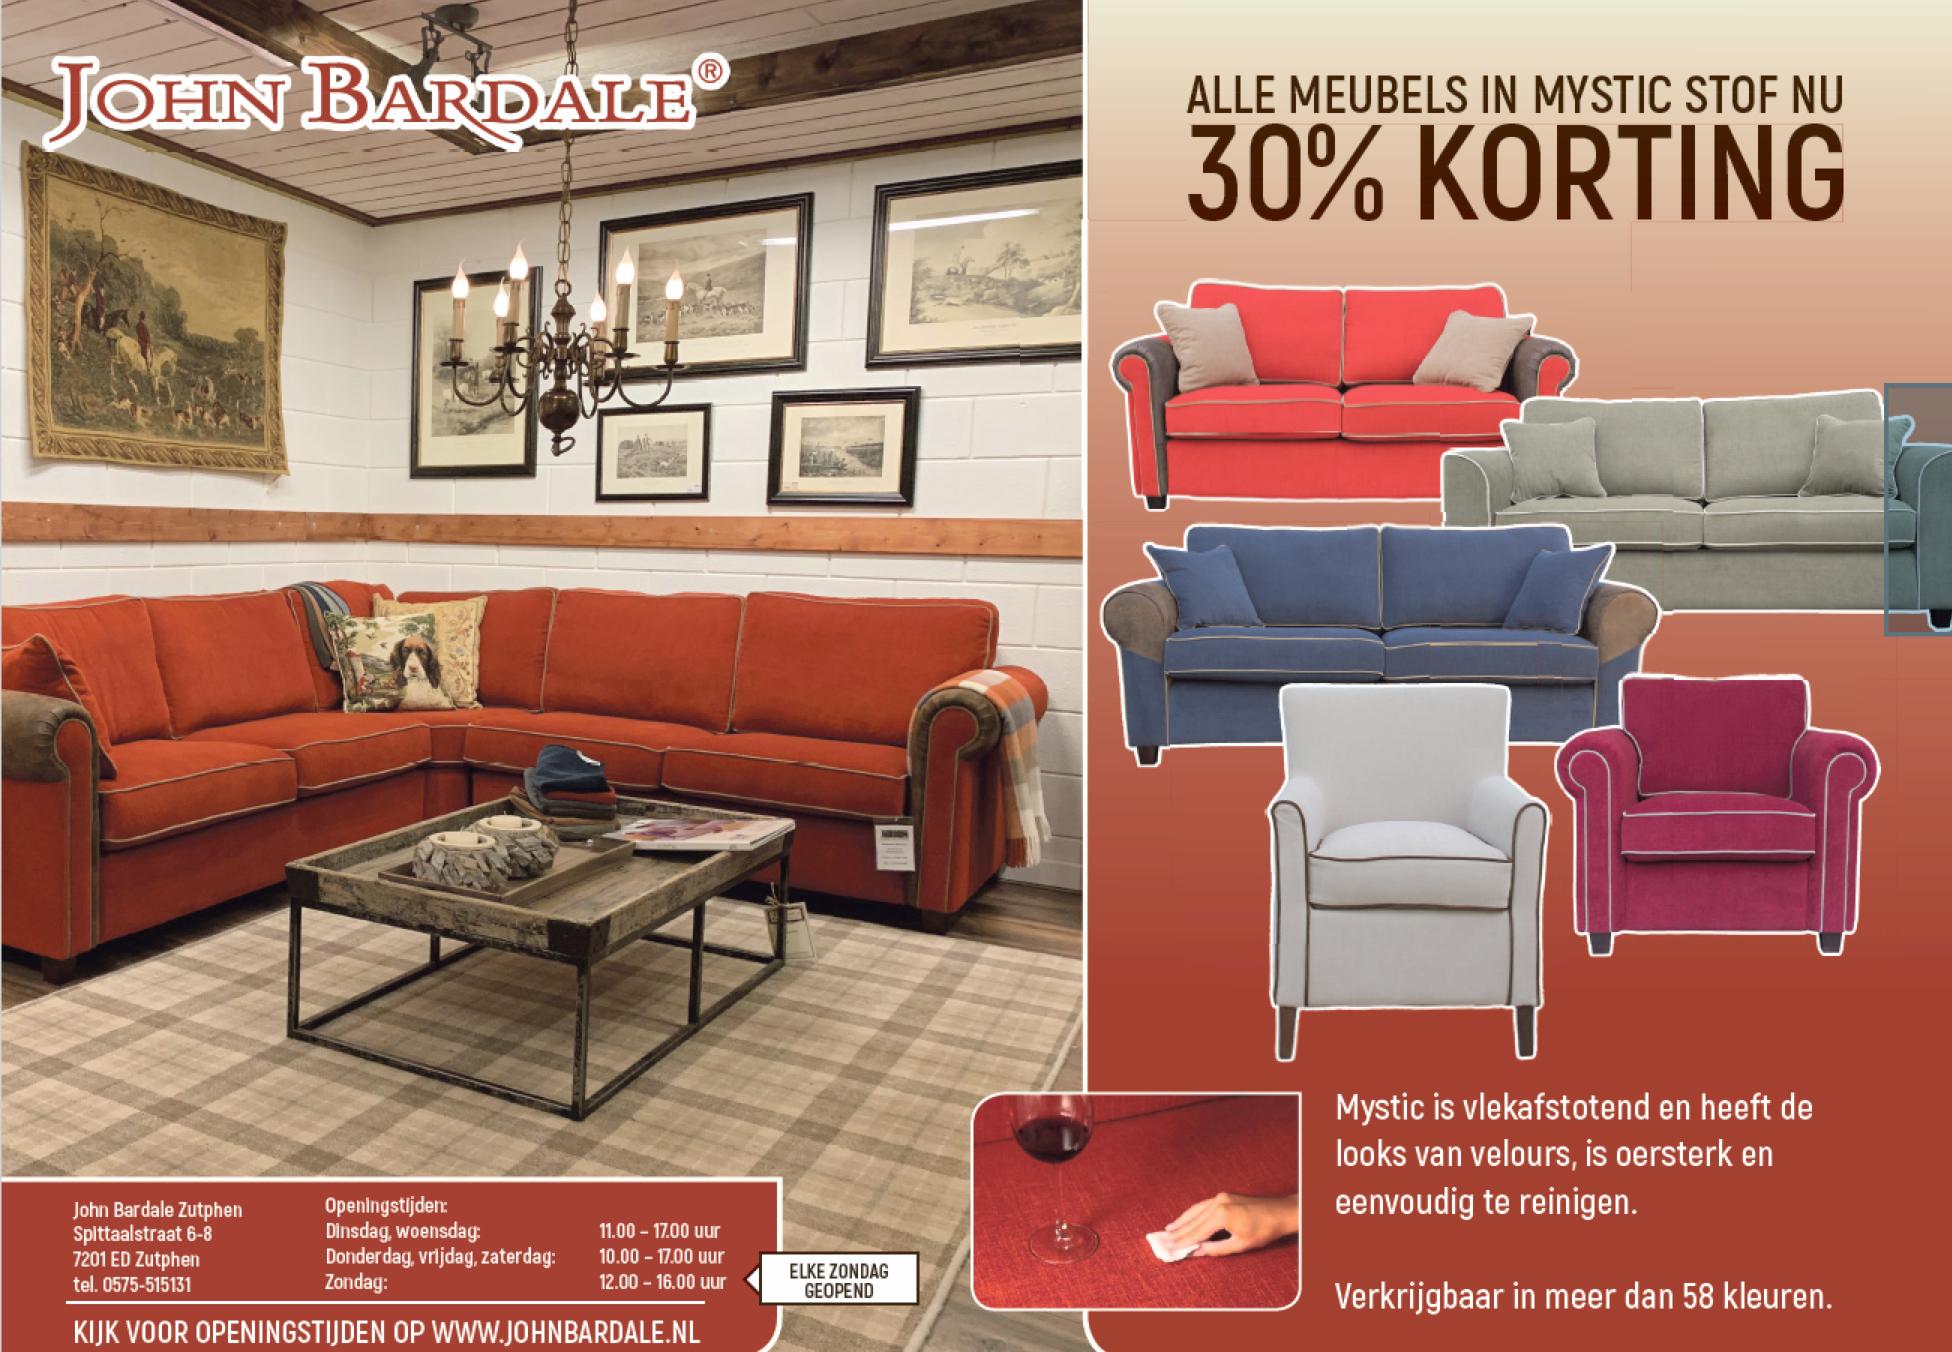 30% korting op ALLE meubels in MYSTIC stoffen